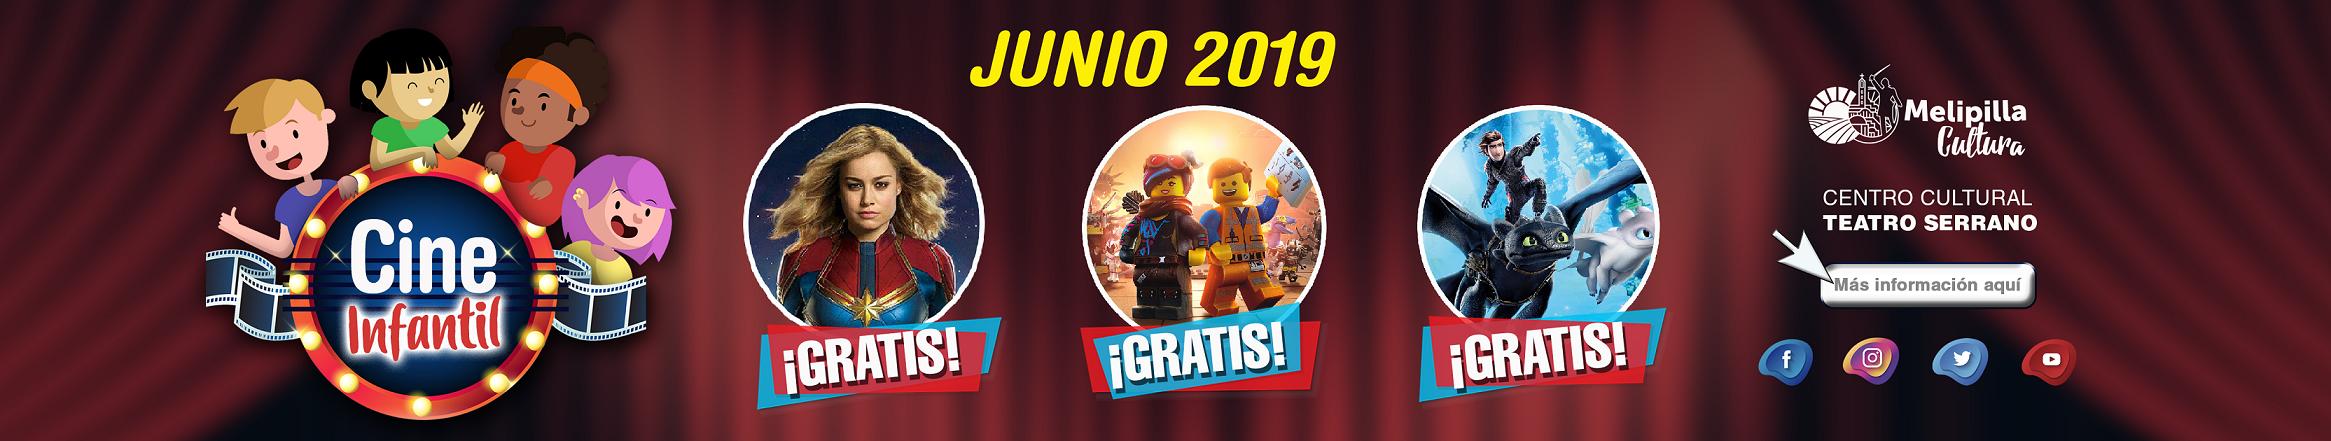 slider-CARTELERA-INFANTIL-CINE-JUNIO-2019